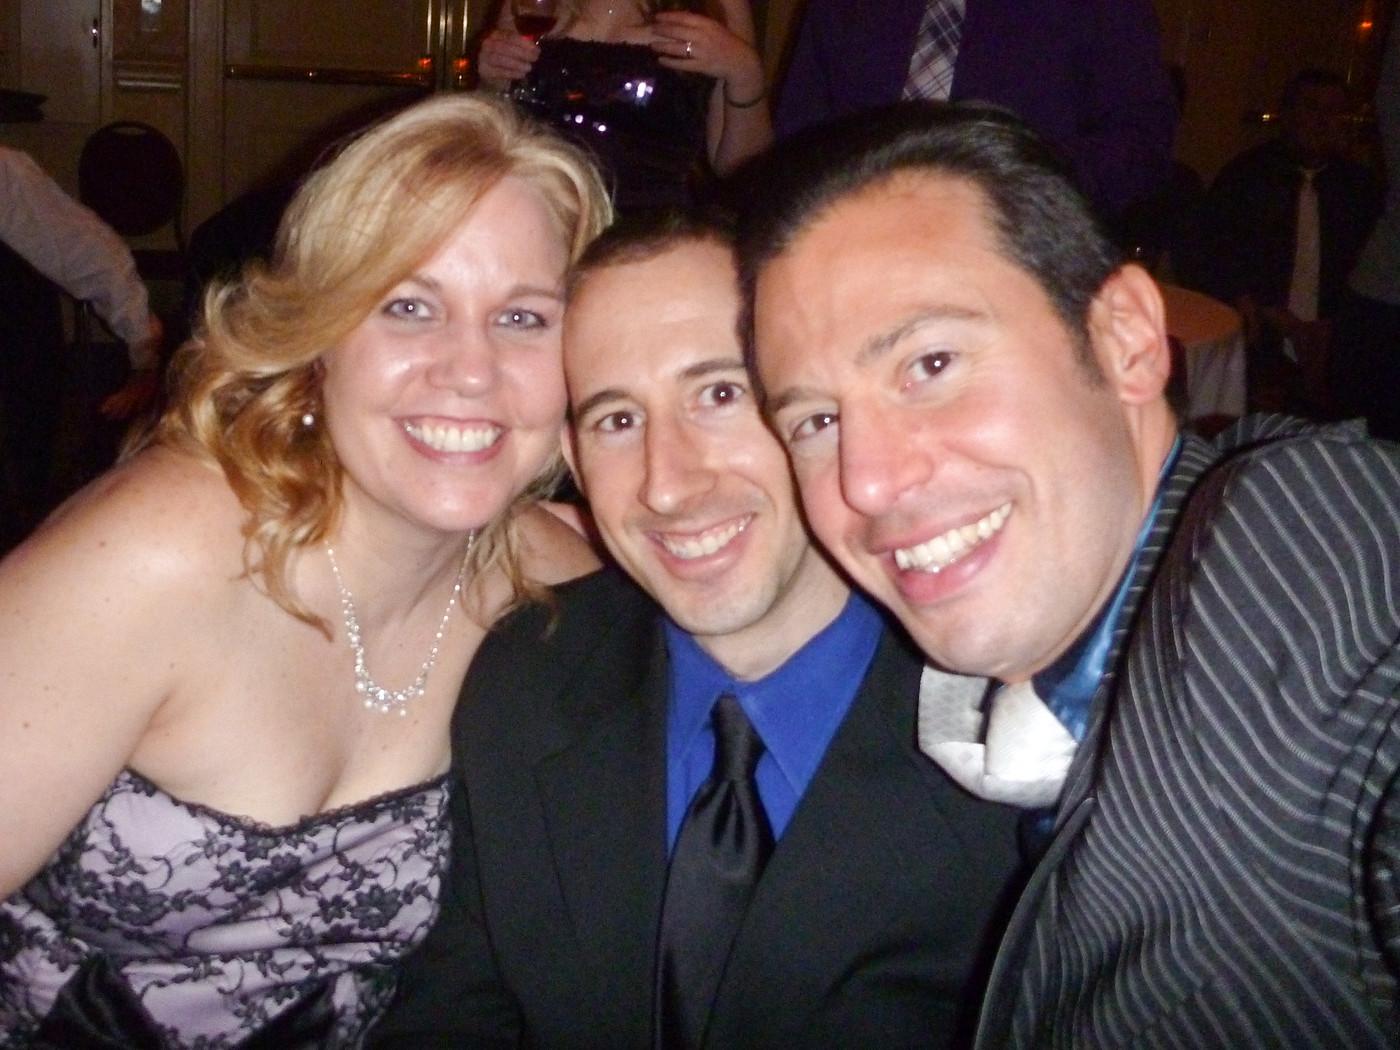 NYDE2011-008 - Janet, Chris, Erik